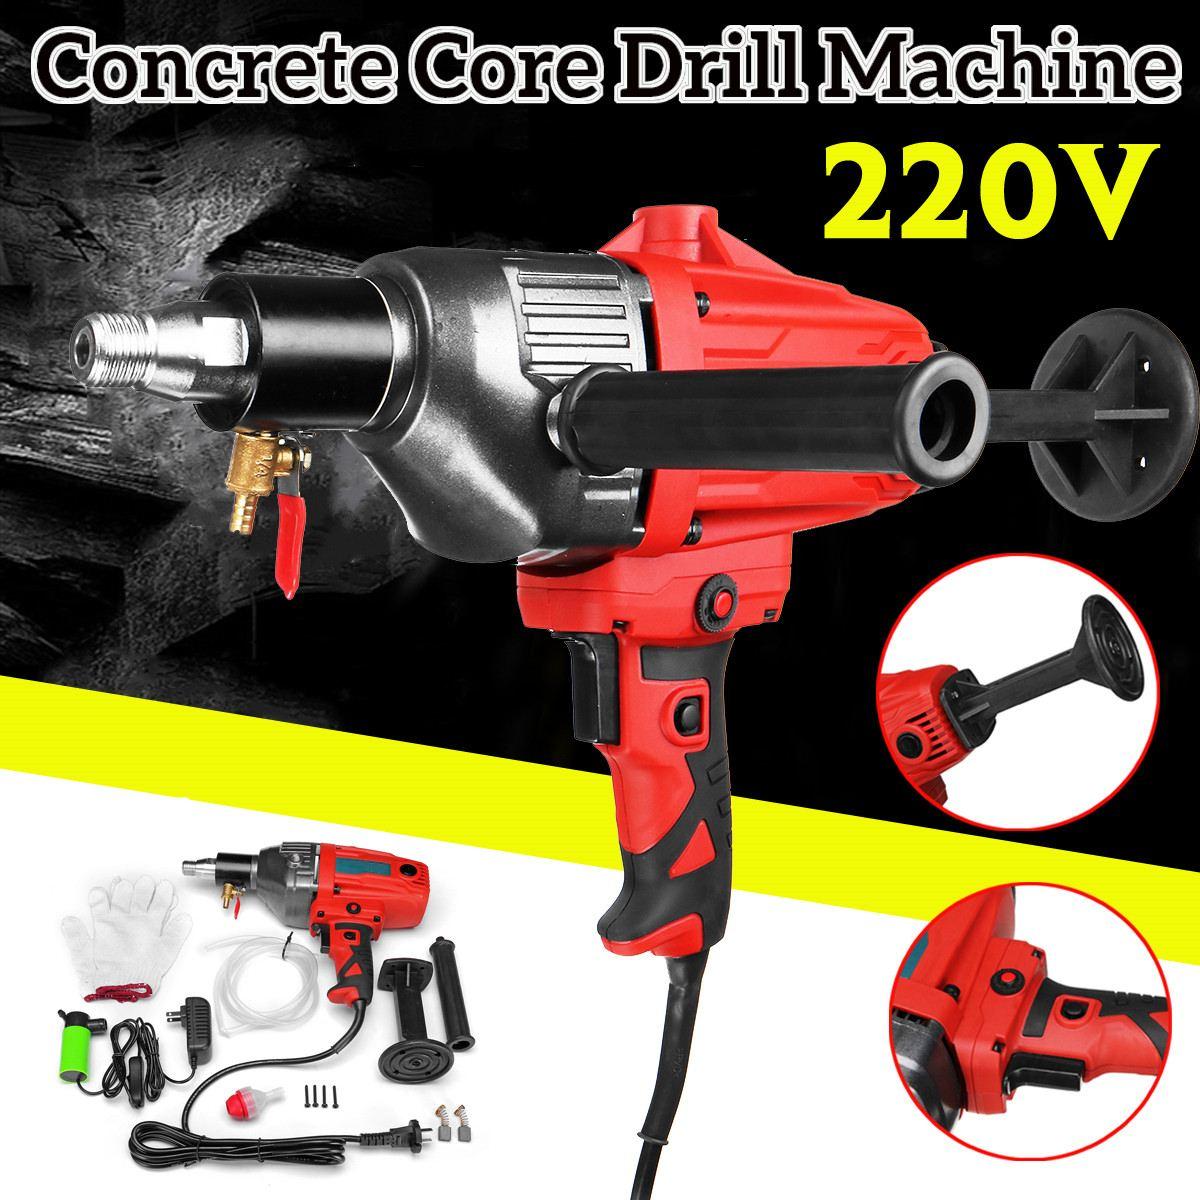 220V 1600W Diamond Concrete Core Drill Hand Held Machine Set 110mm Wet Drilling Powerful Concrete Core Drill Machine Power Tool